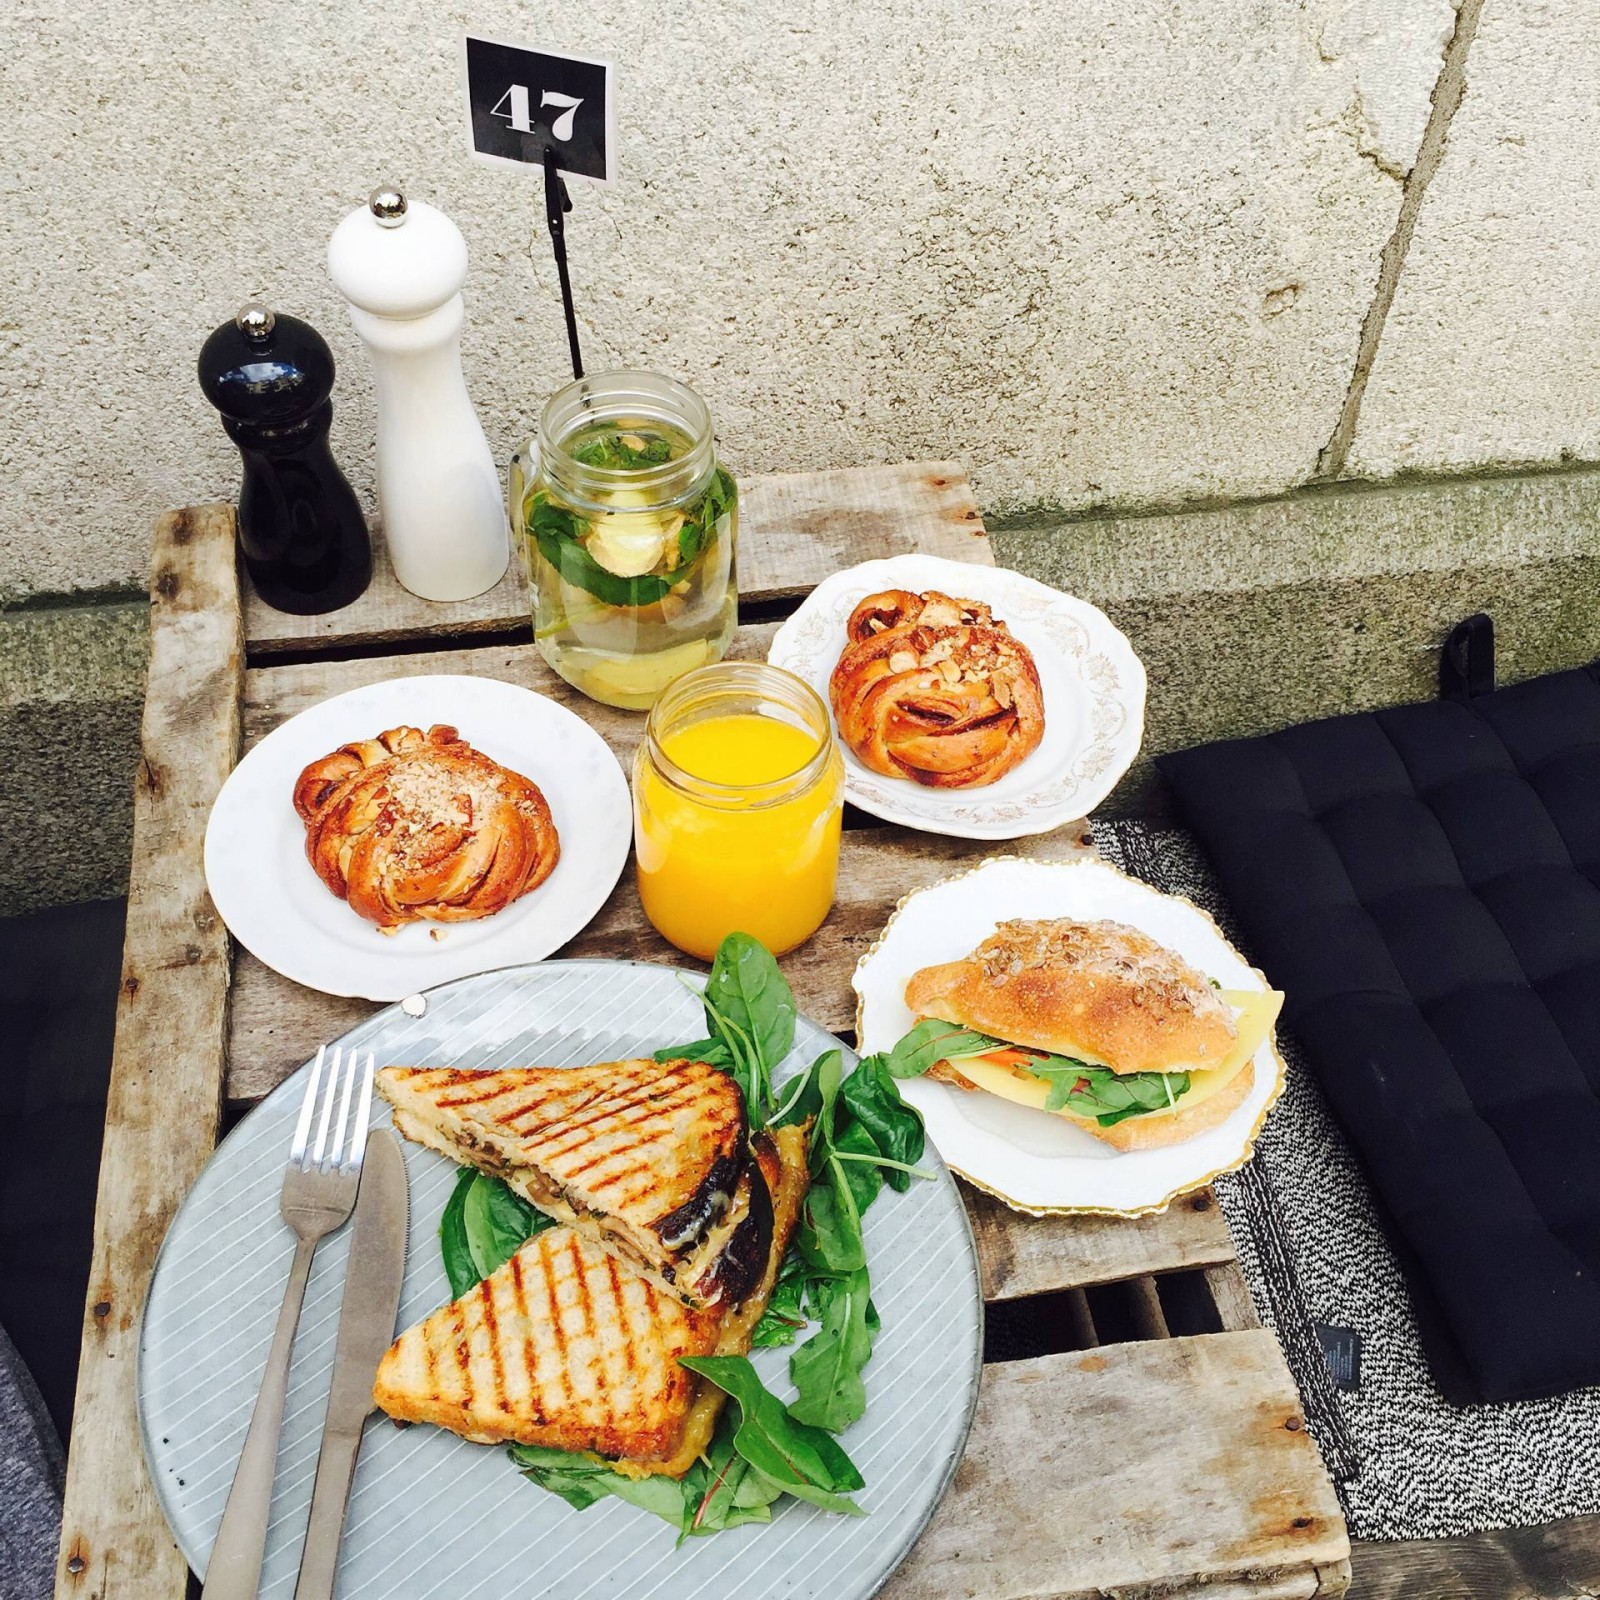 BONNES ADRESSES FOOD/SHOPPING A STOCKHOLM